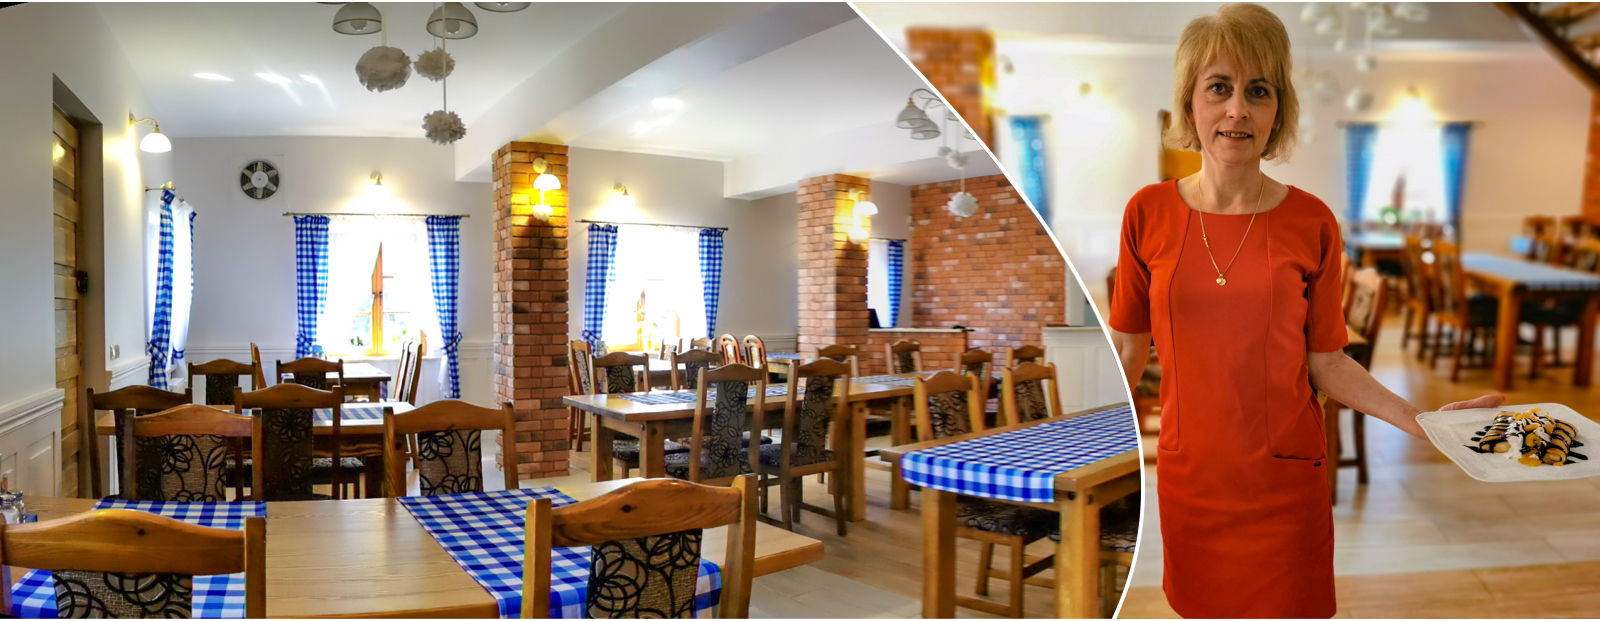 Restauracje na Mazurach, Ukta, Restauracja Kajaki Centrum